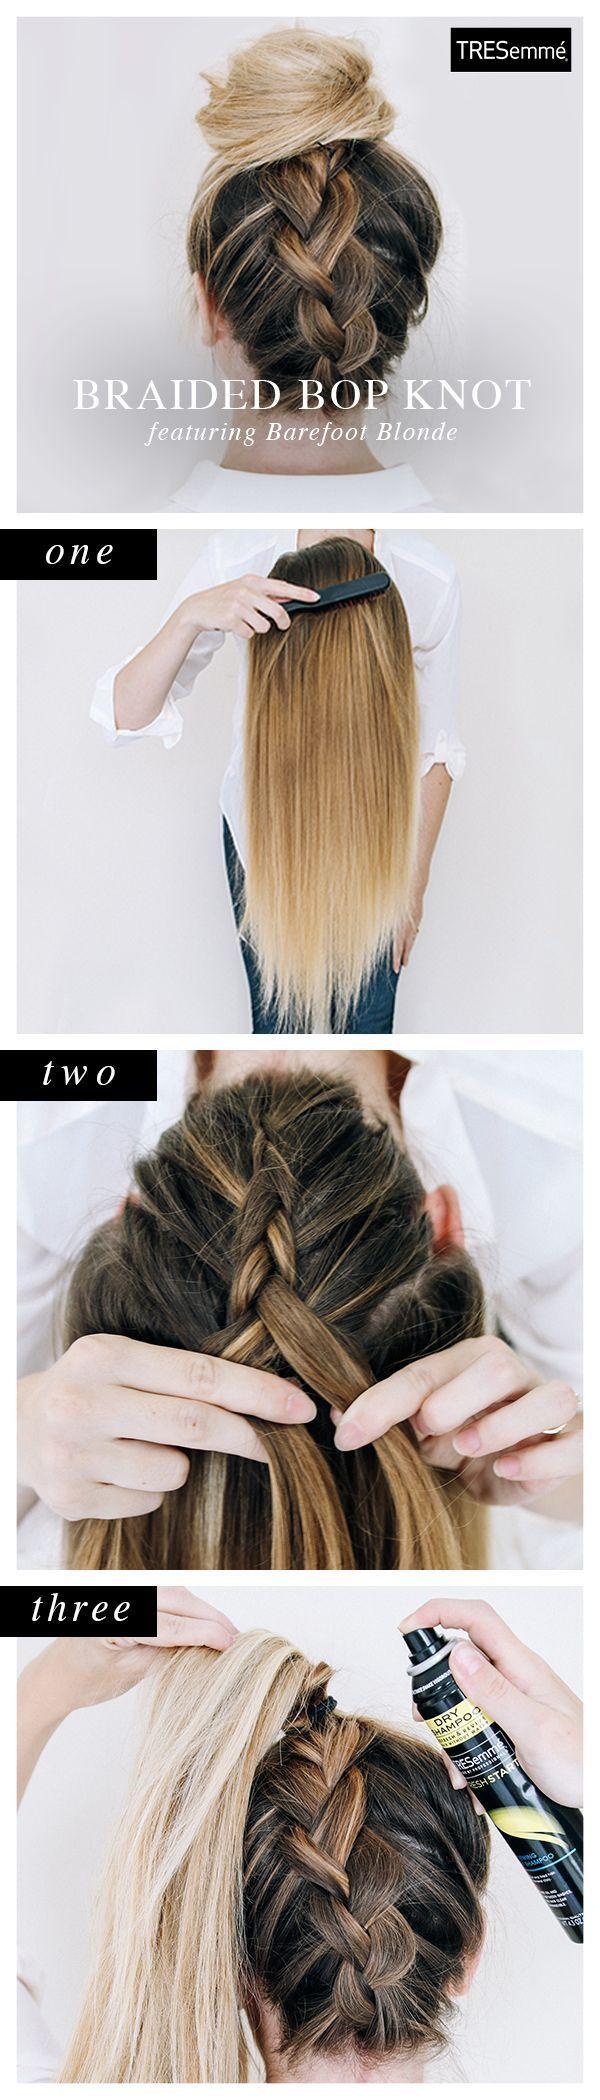 Braided Bop Knot Updo diy long hair updo braids diy hair diy bun hairstyles hair tutorials easy hairstyles